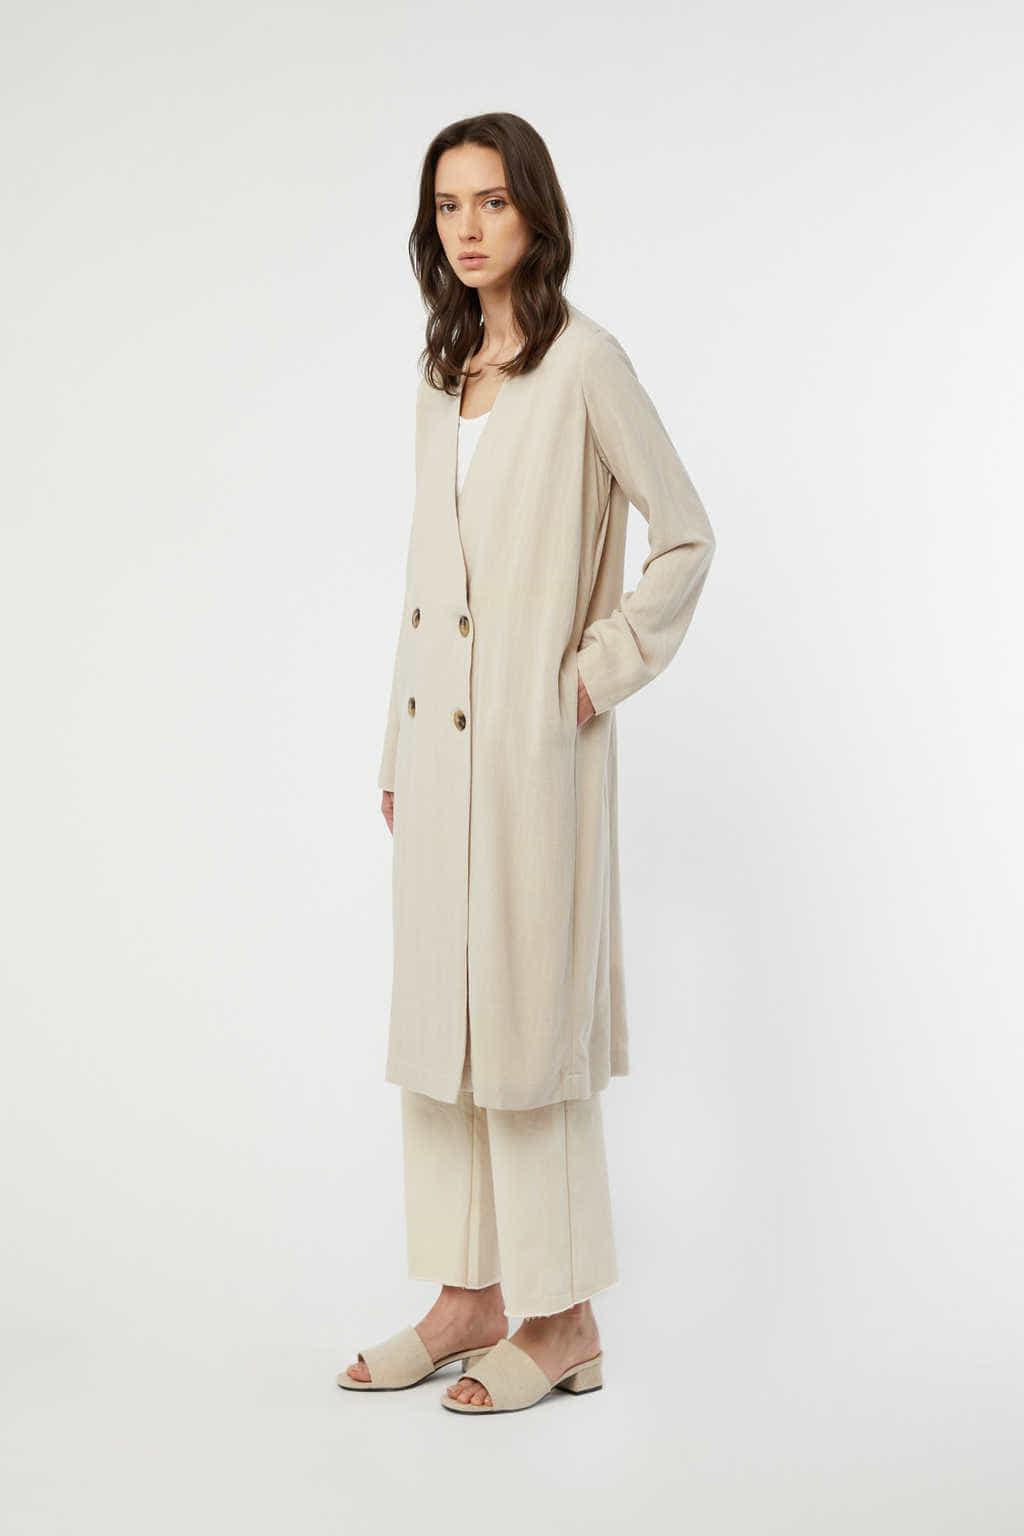 Coat 3170 Oatmeal 2